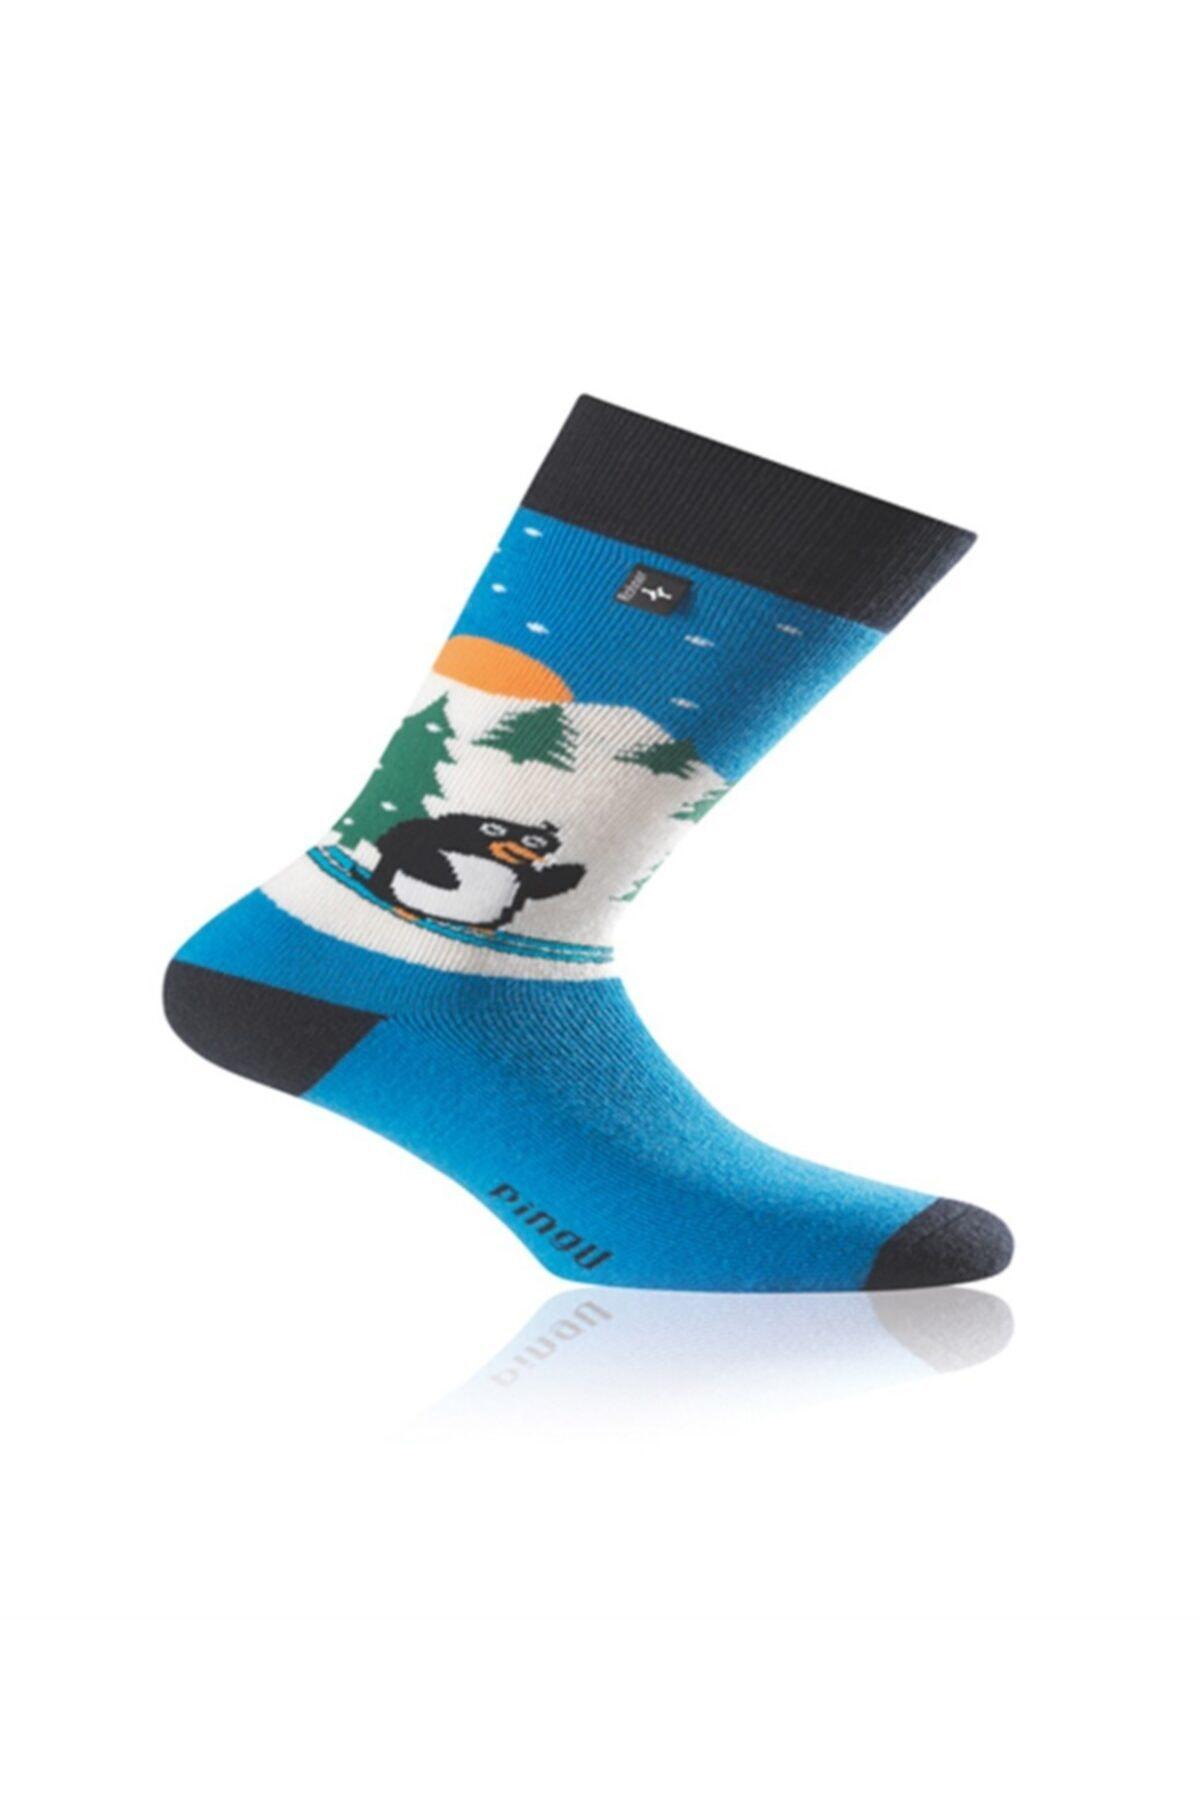 Rohner Pınguın Skı Socks 1